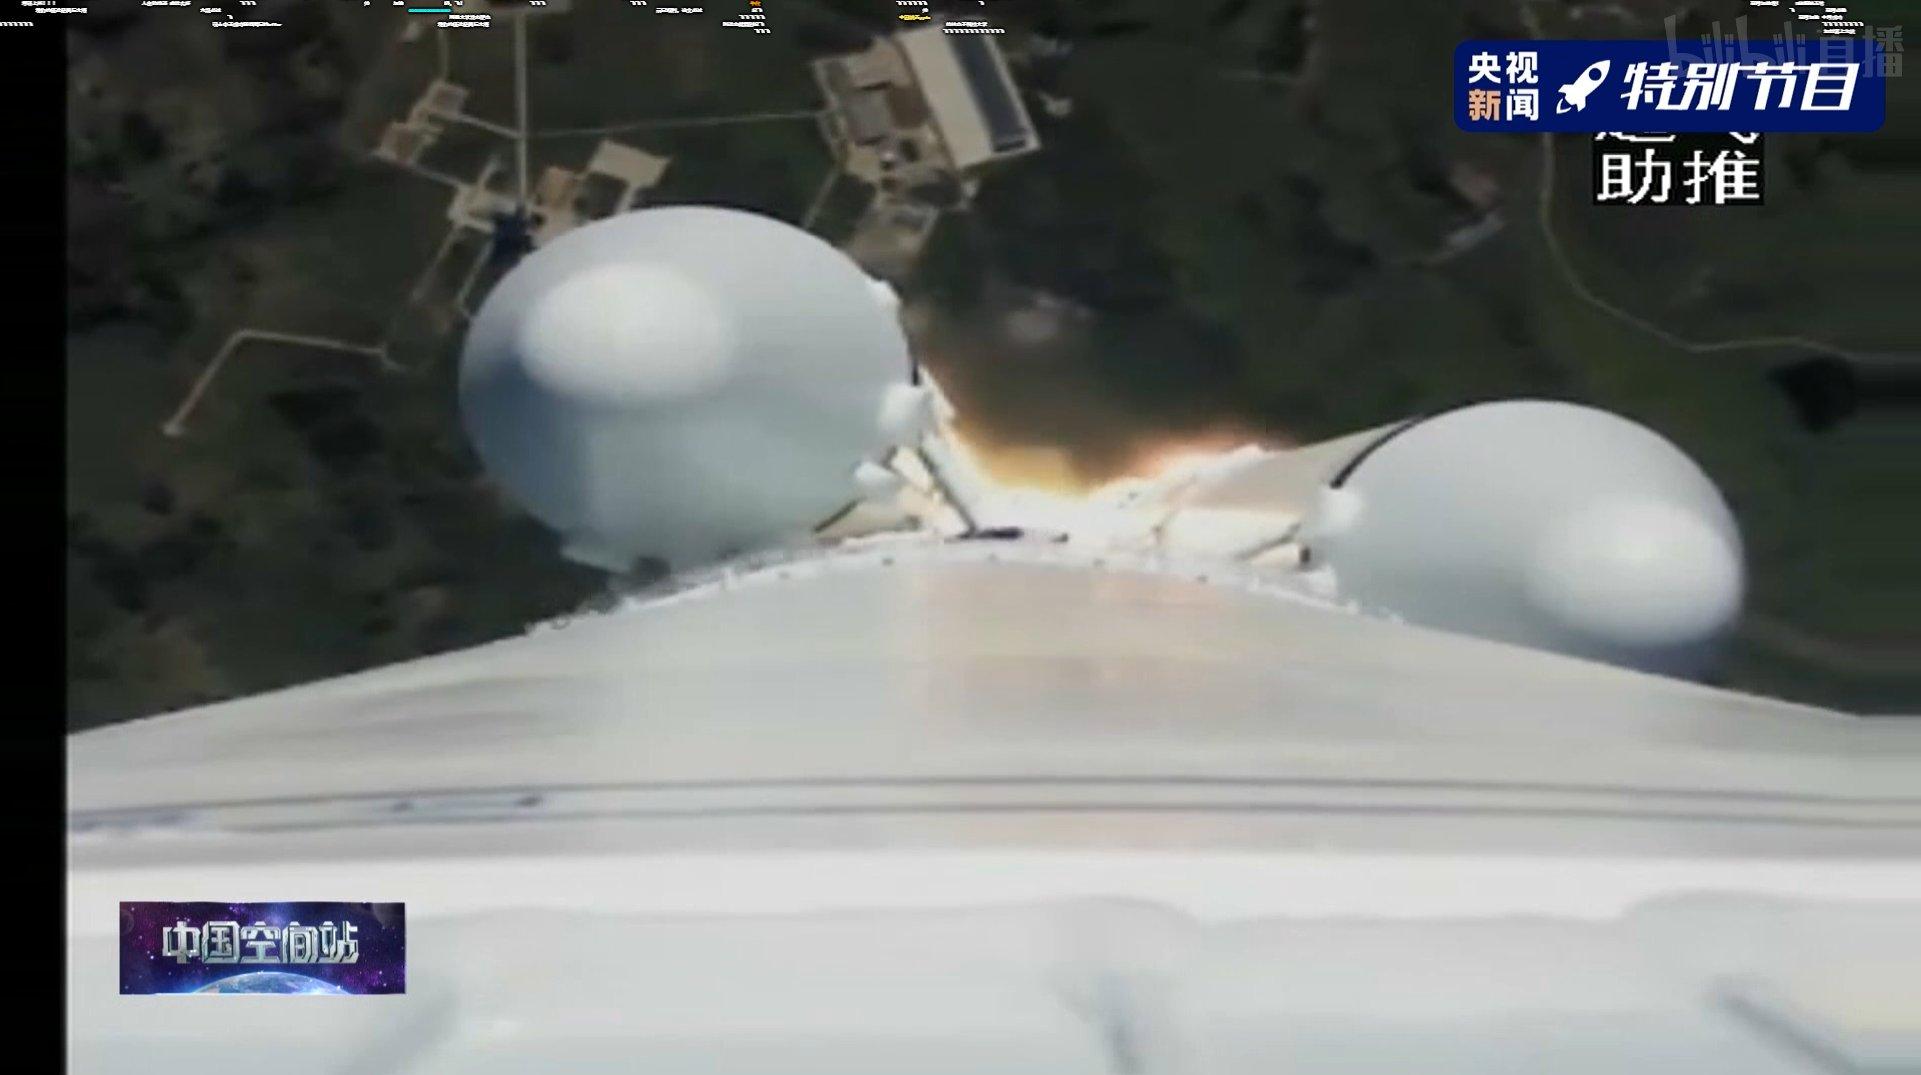 2021-tianzhou-3-lifts-off.jpg